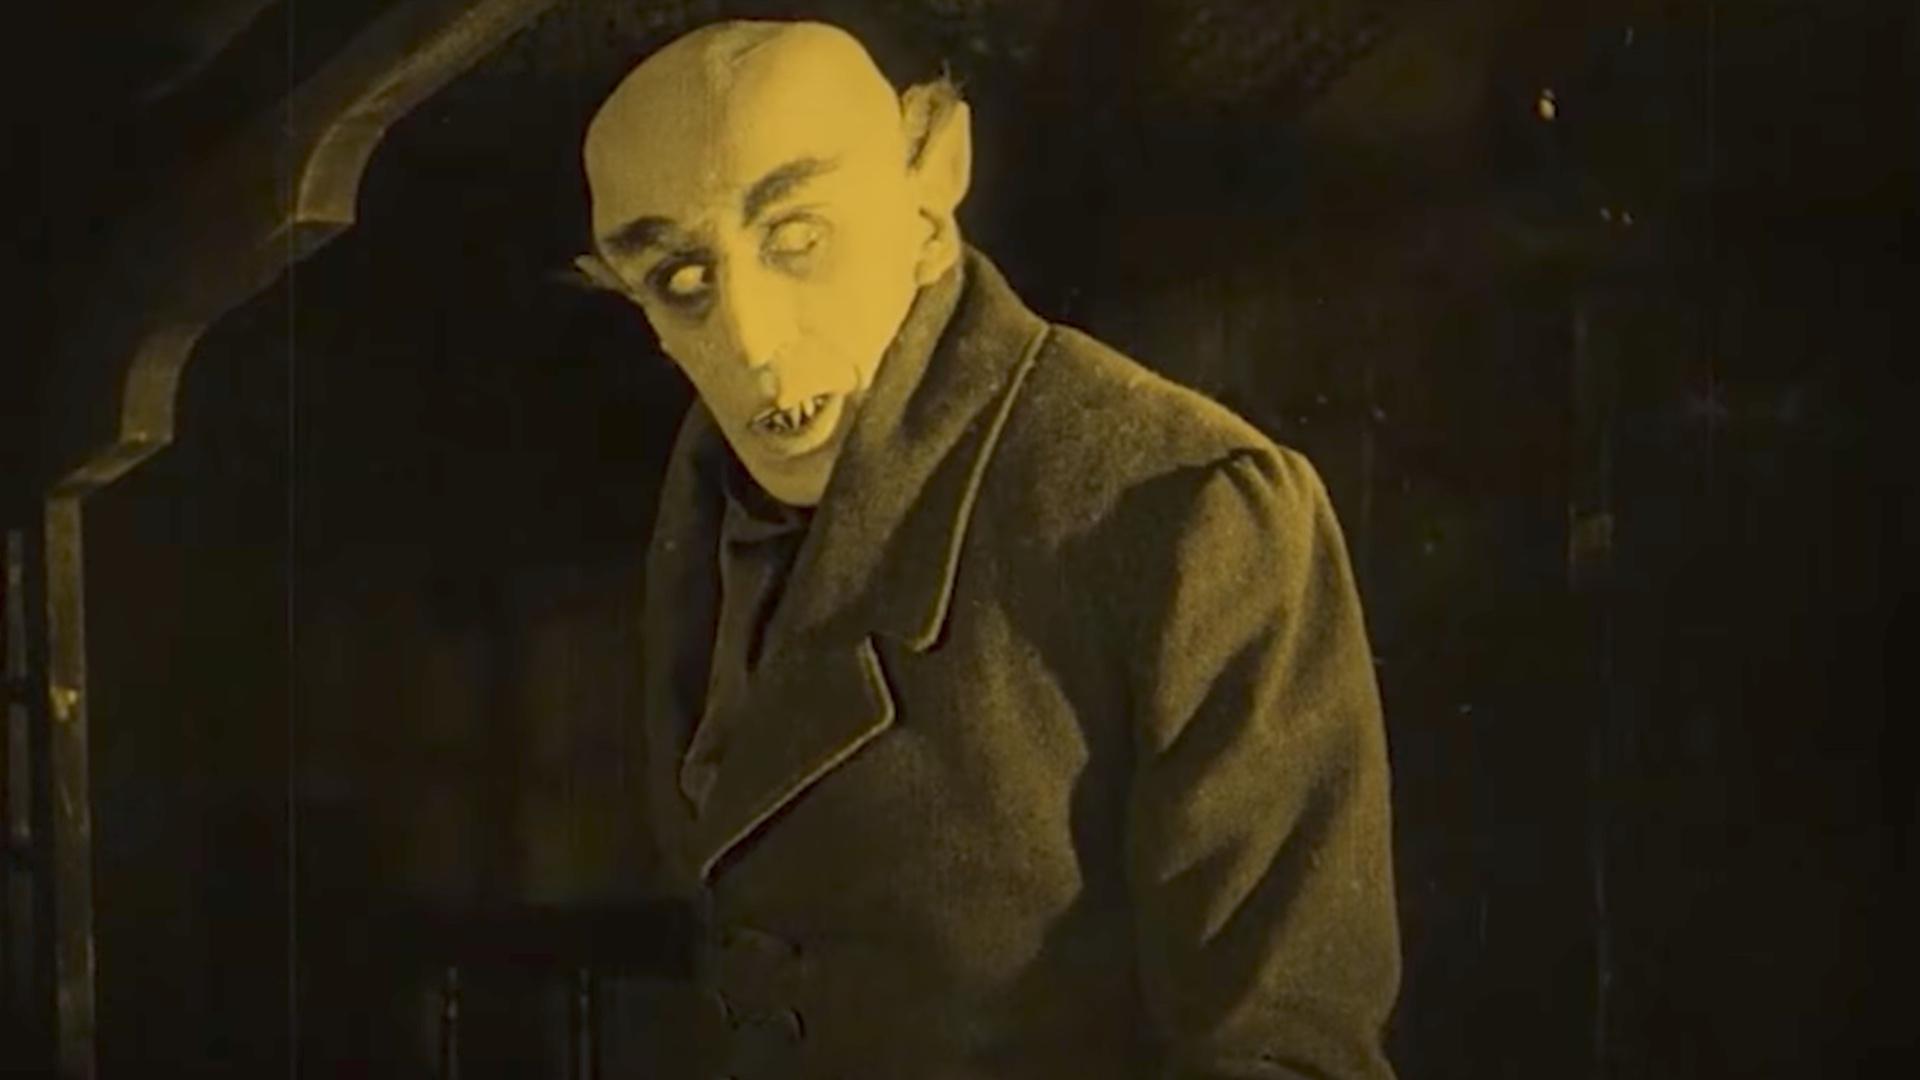 Nosferatu 1922 Pictures - #GolfClub